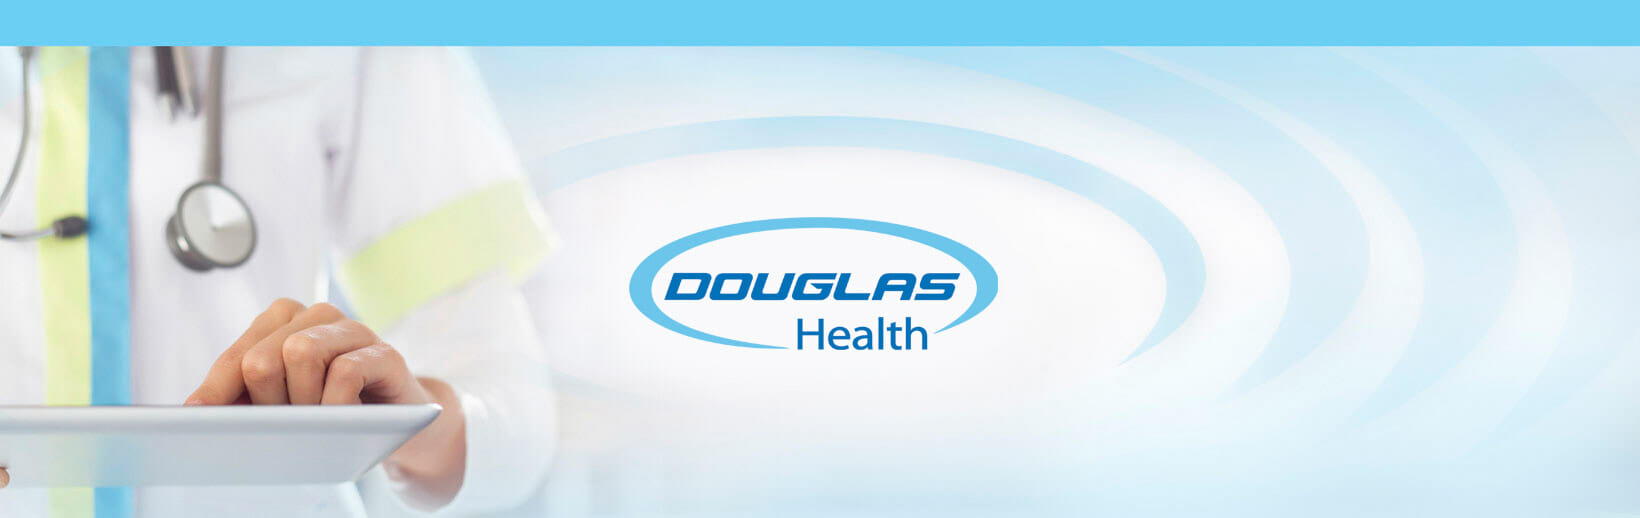 Douglas health banner